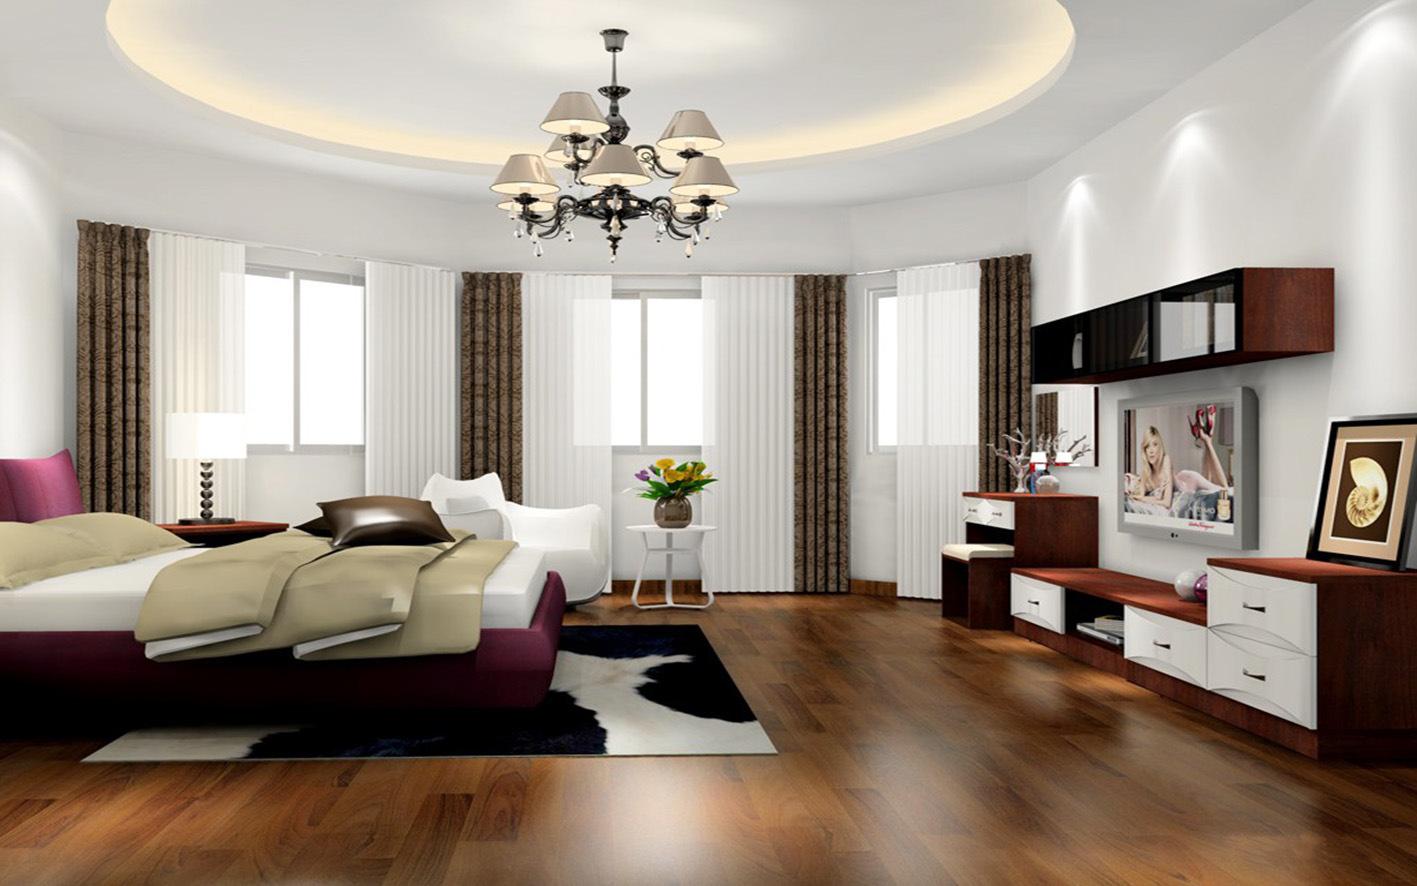 Modern Plywood Wardrobe Design (zy-039)